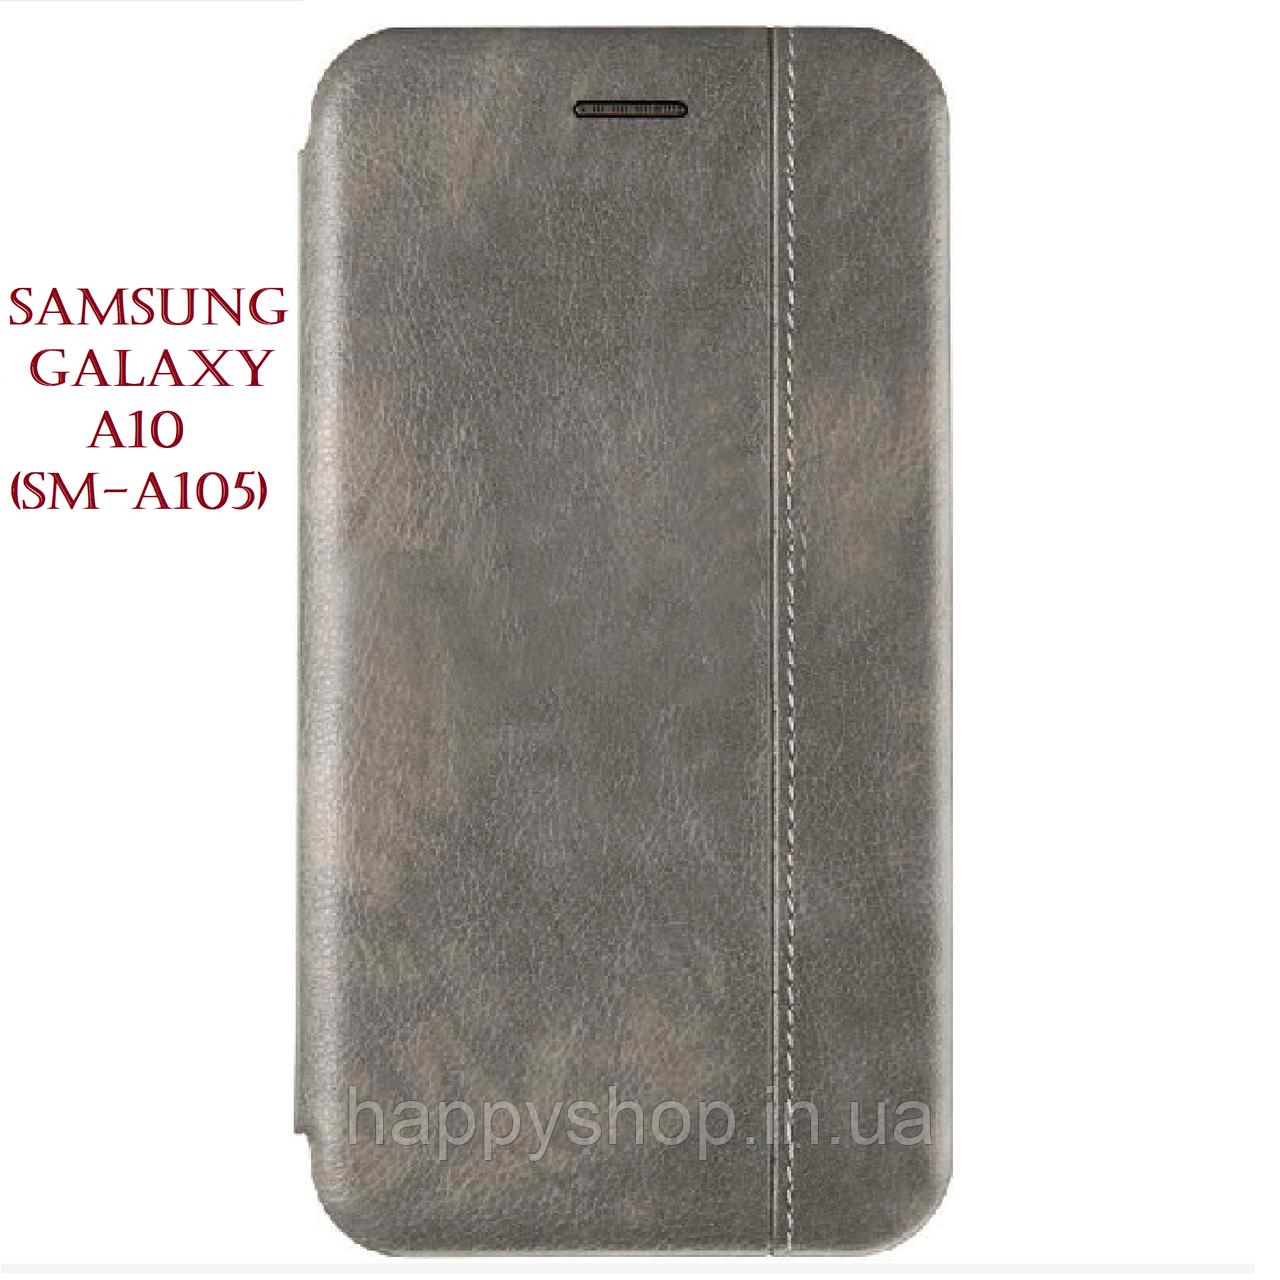 Чехол-книжка Gelius Leather для Samsung Galaxy A10 (SM-A105) Серый